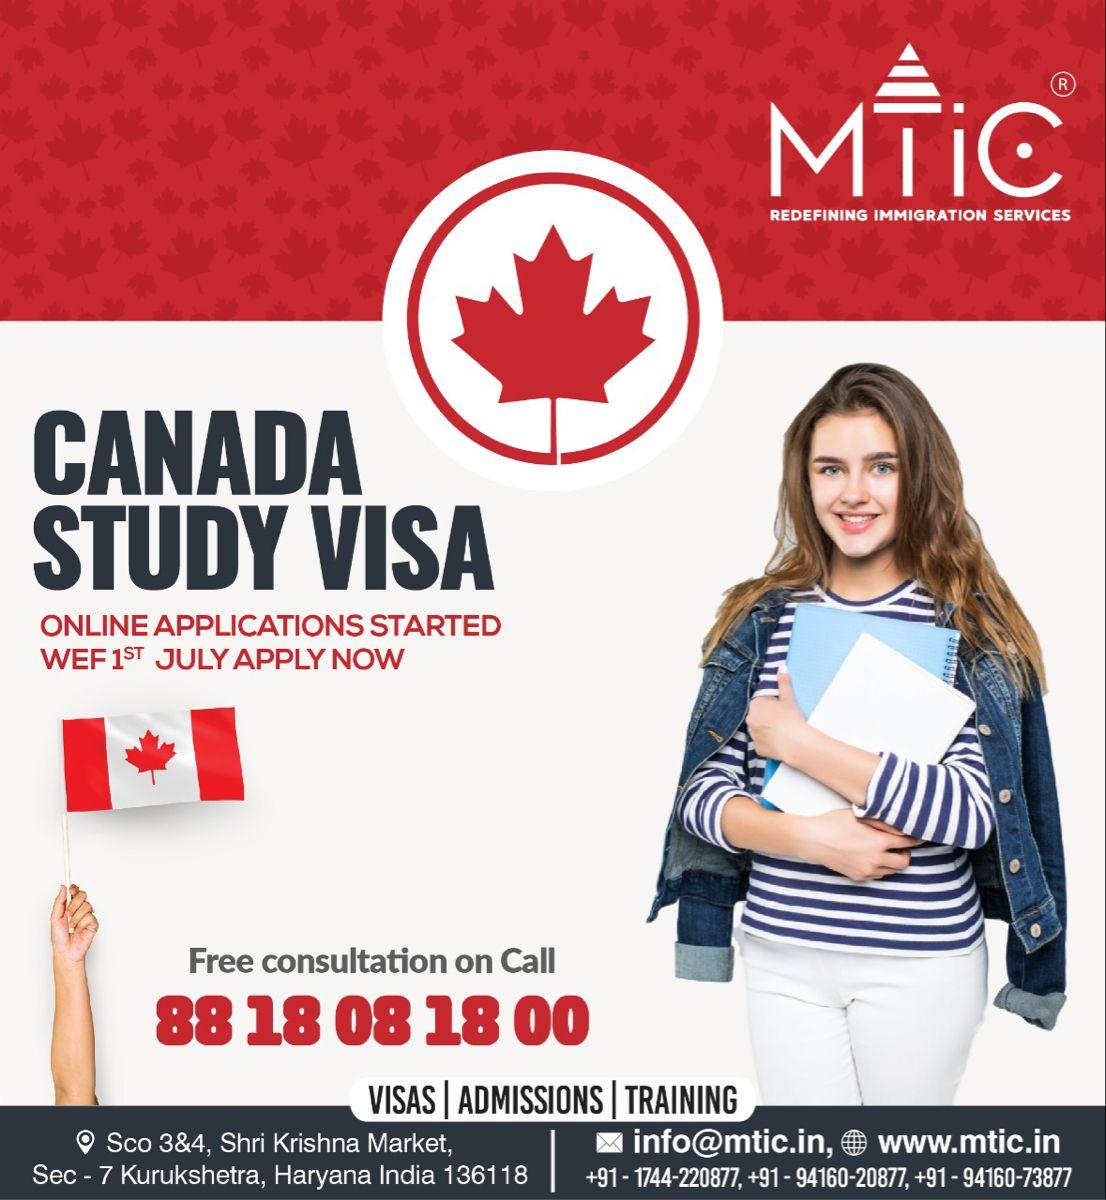 Canada Visa Update By Mtic In 2020 Visa Online Visa Service Canada